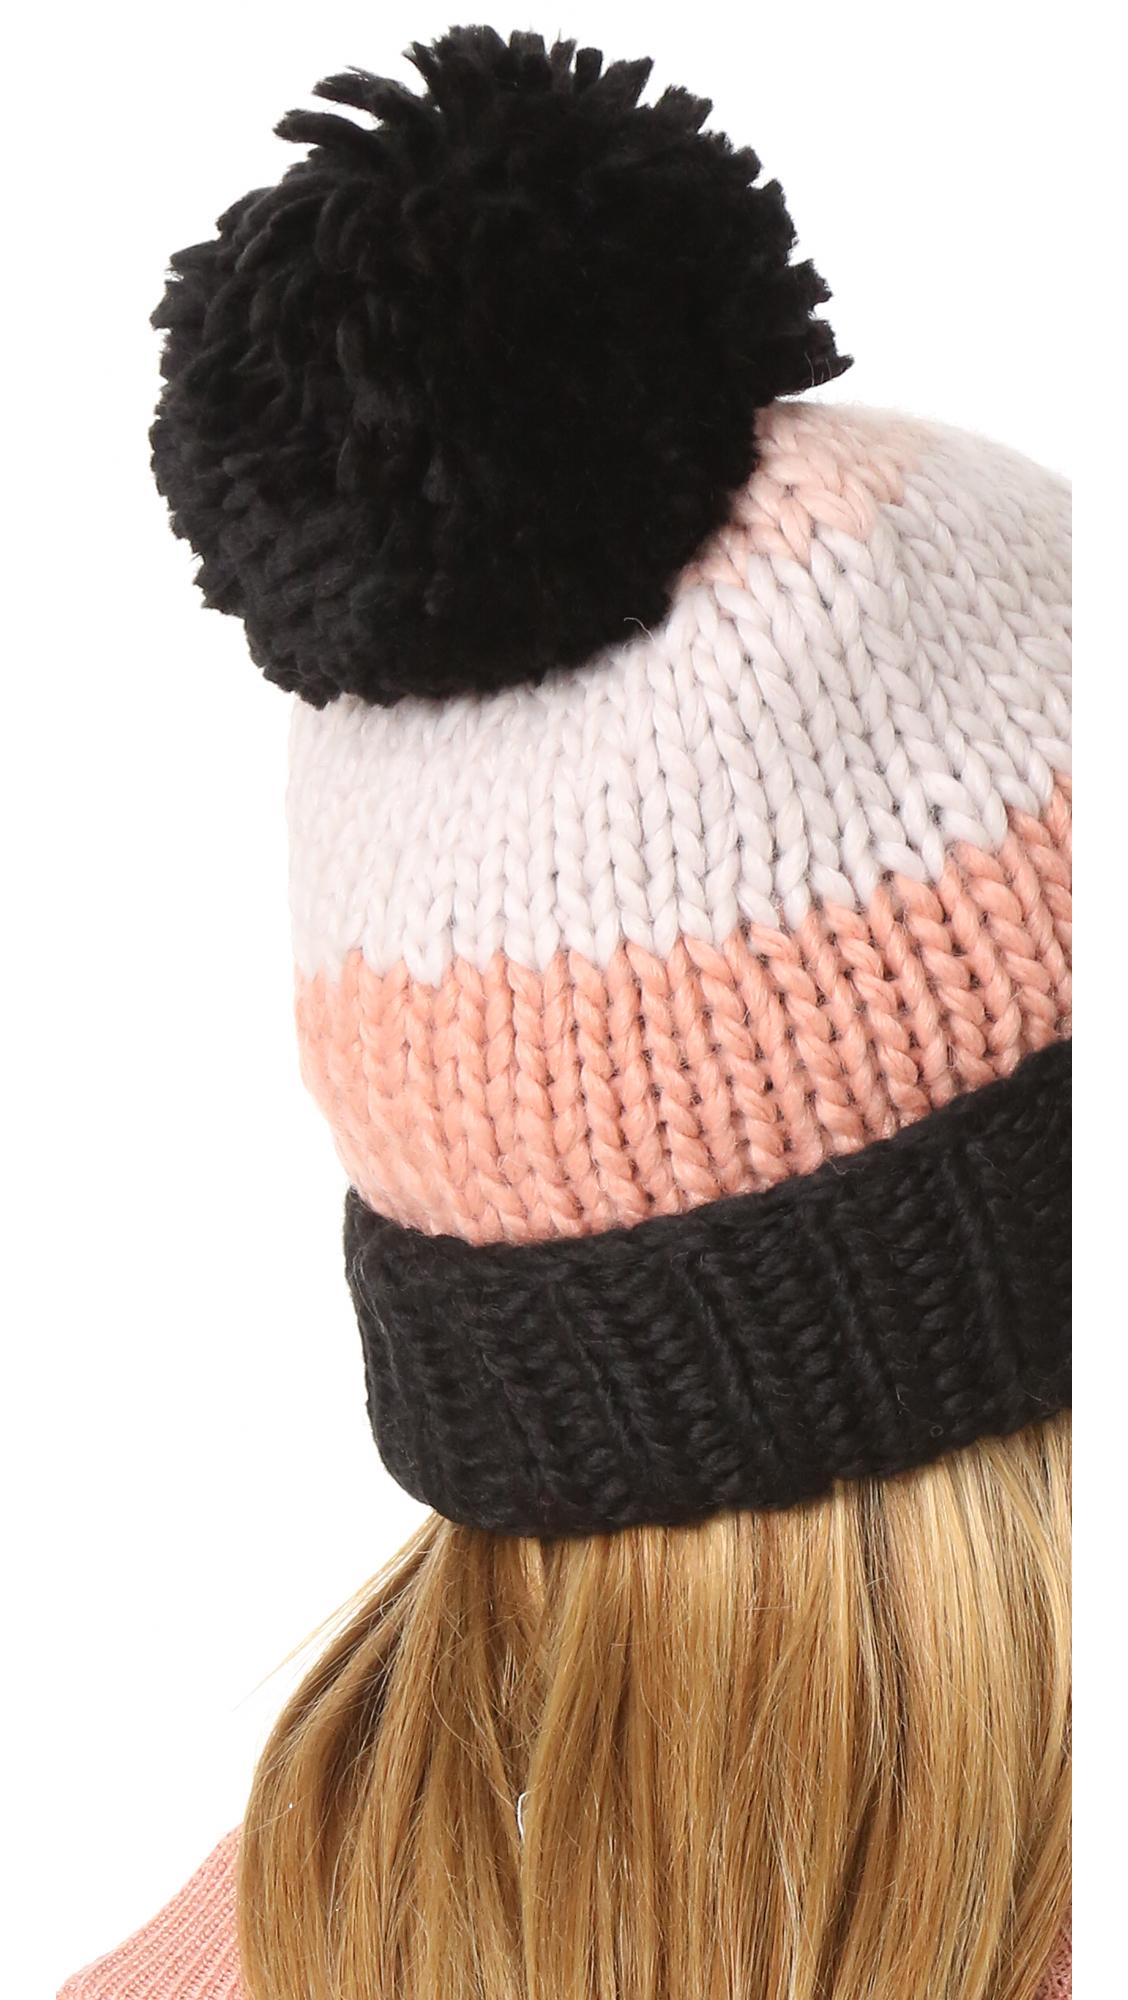 Kate Spade New York Chunky Knit Colorblock Beanie  5a4b03f9254